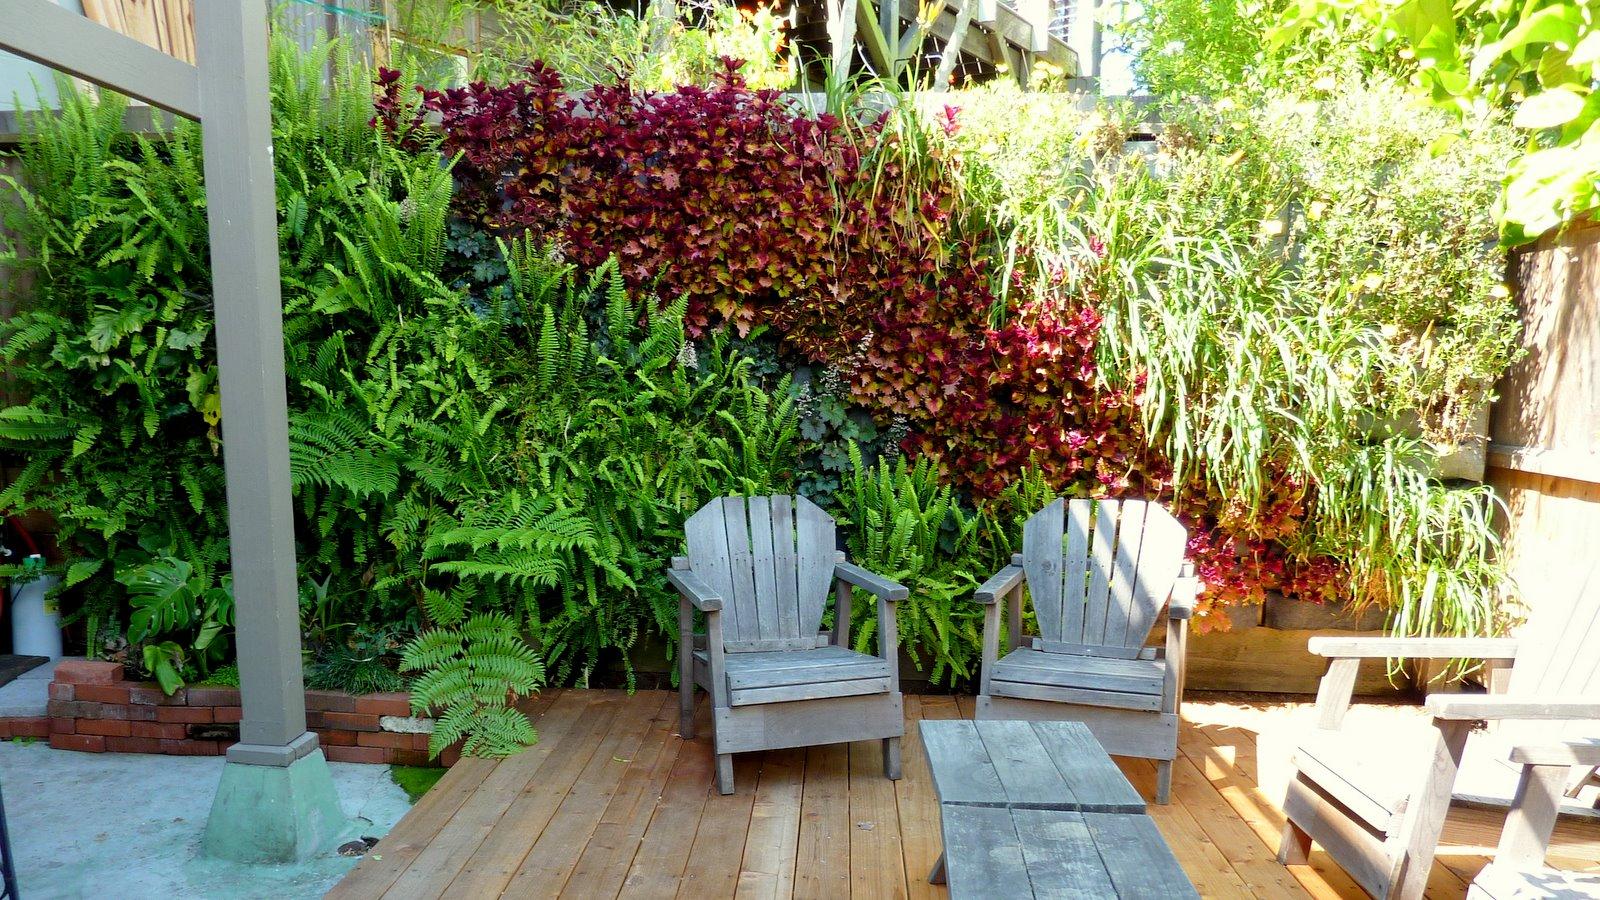 Plants on walls vertical garden systems august 2011 - Jardin vertical en casa ...